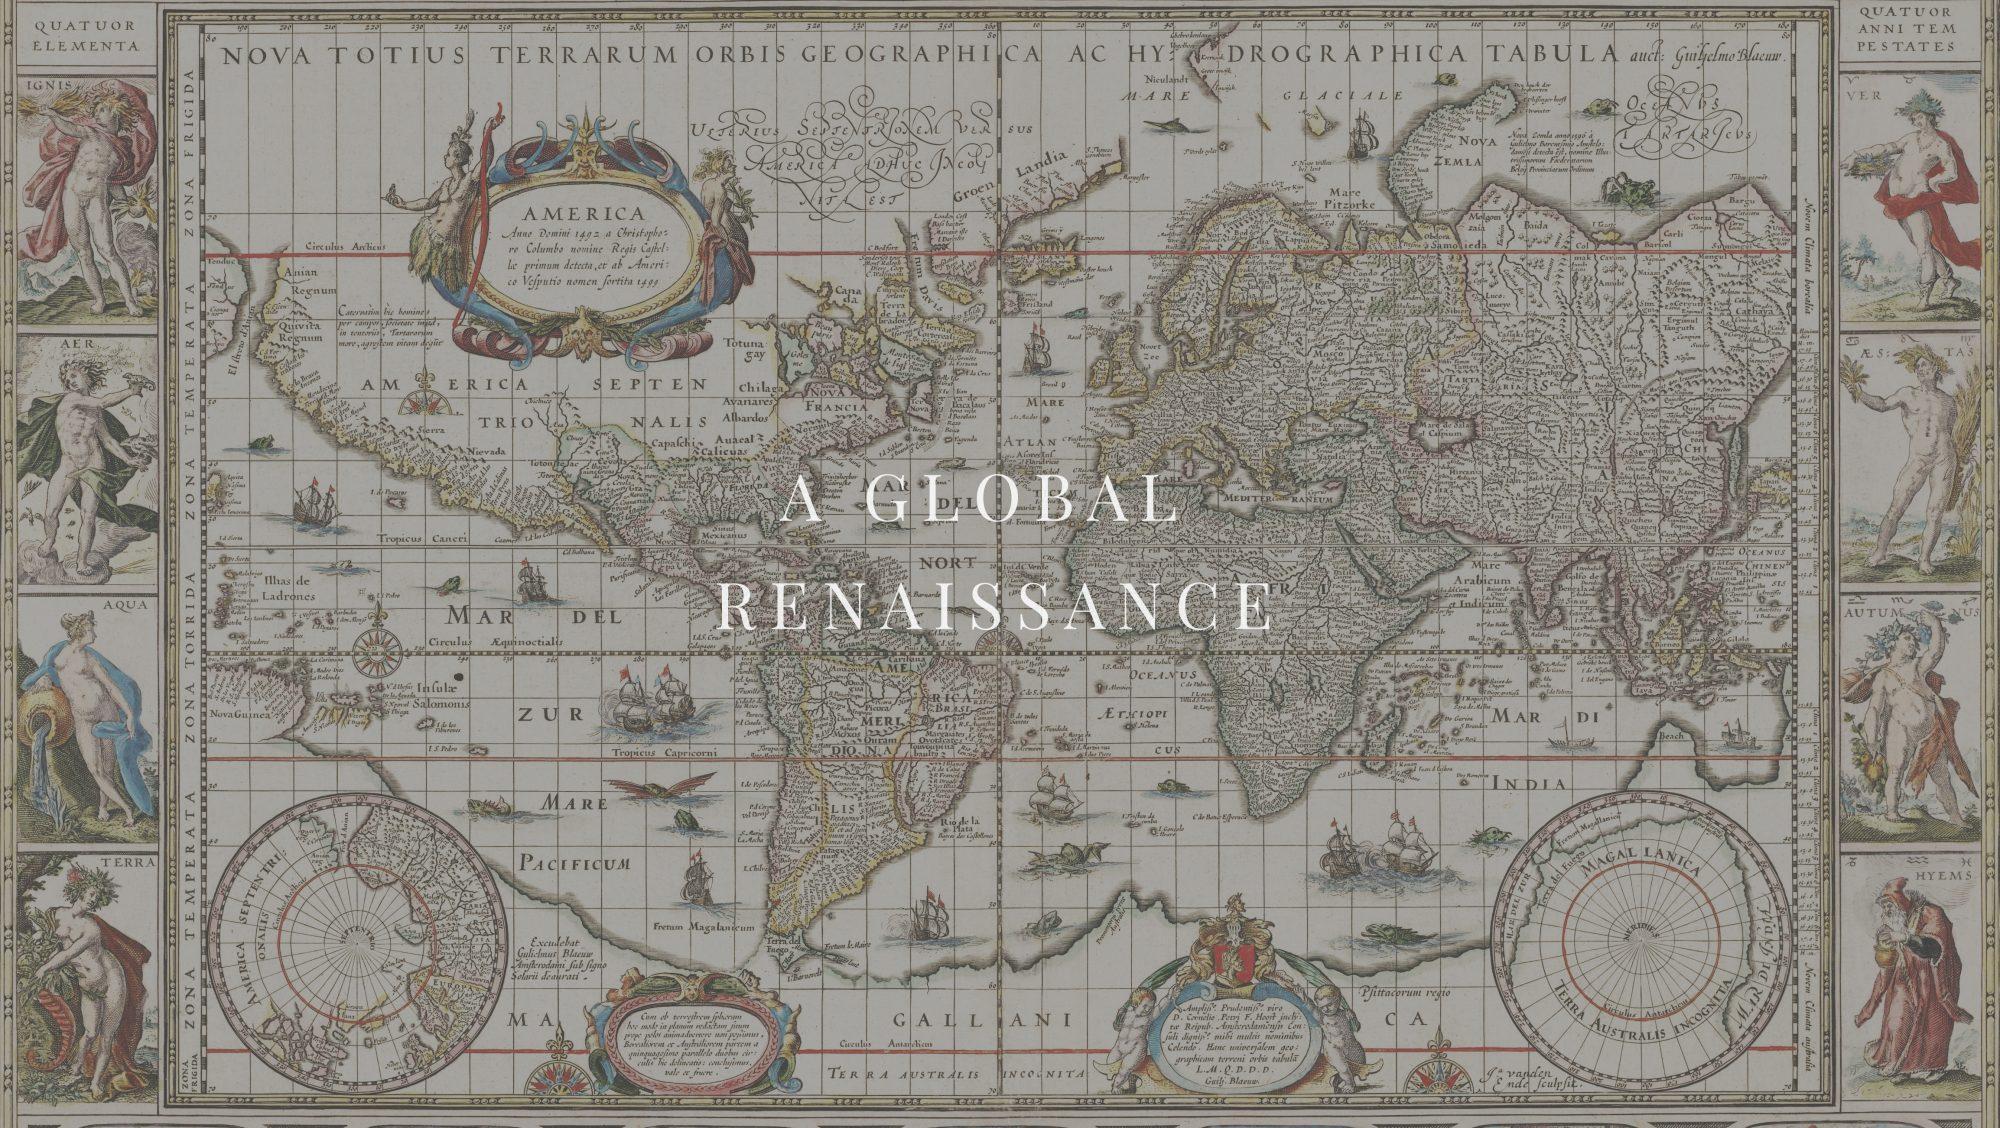 A GLOBAL RENAISSANCE